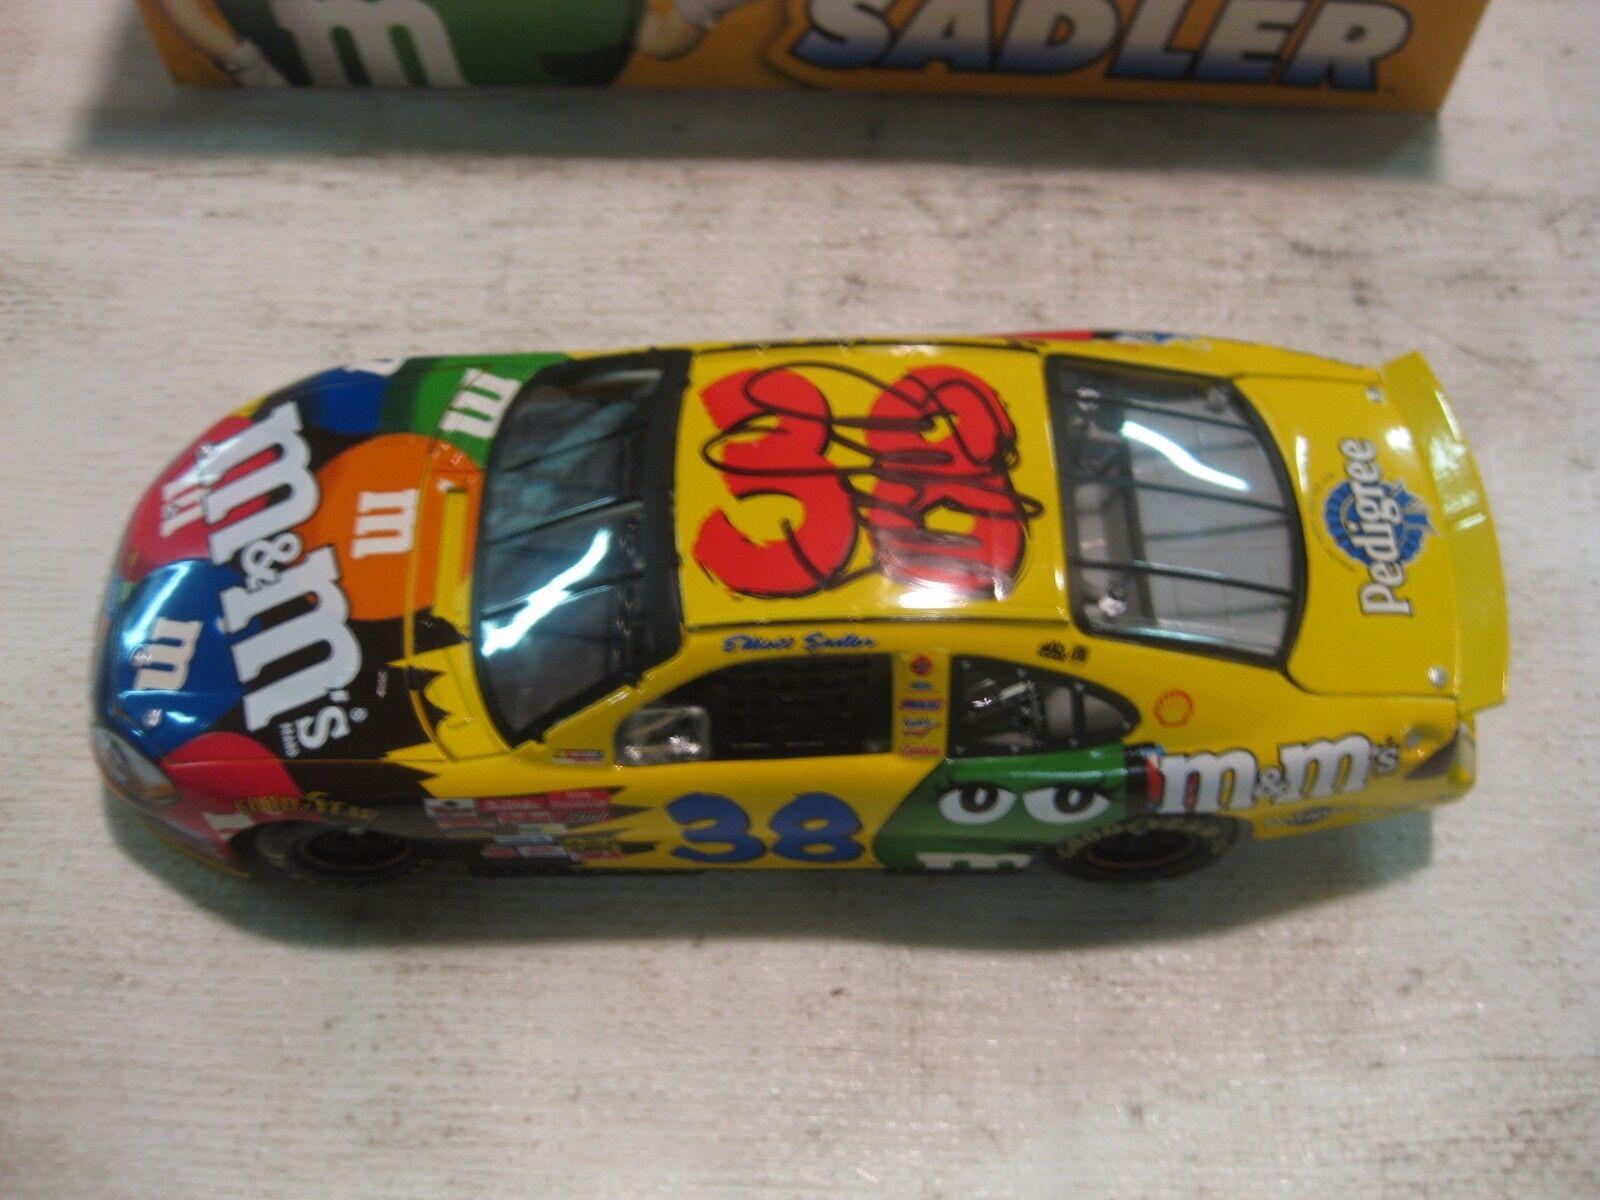 Rare LE Nascar Nascar Nascar  38 Ford Taurus Elliott Sadler M&Ms 124 Scale Diecast 2003 dc1088 0970f2